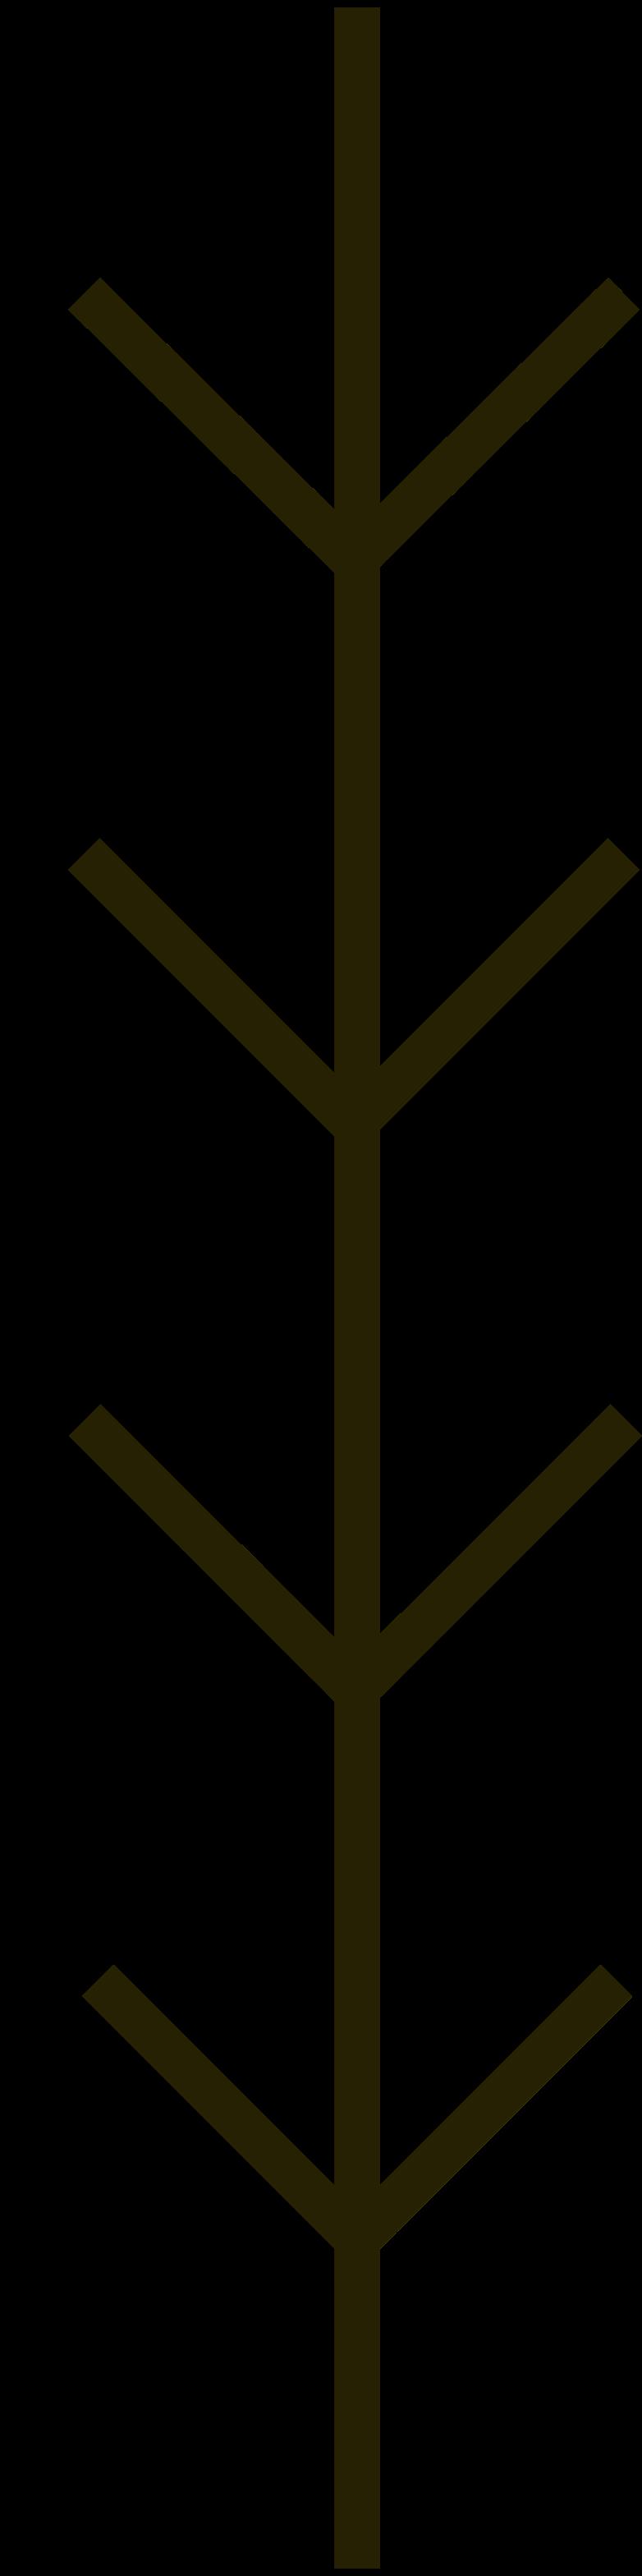 branch Clipart illustration in PNG, SVG